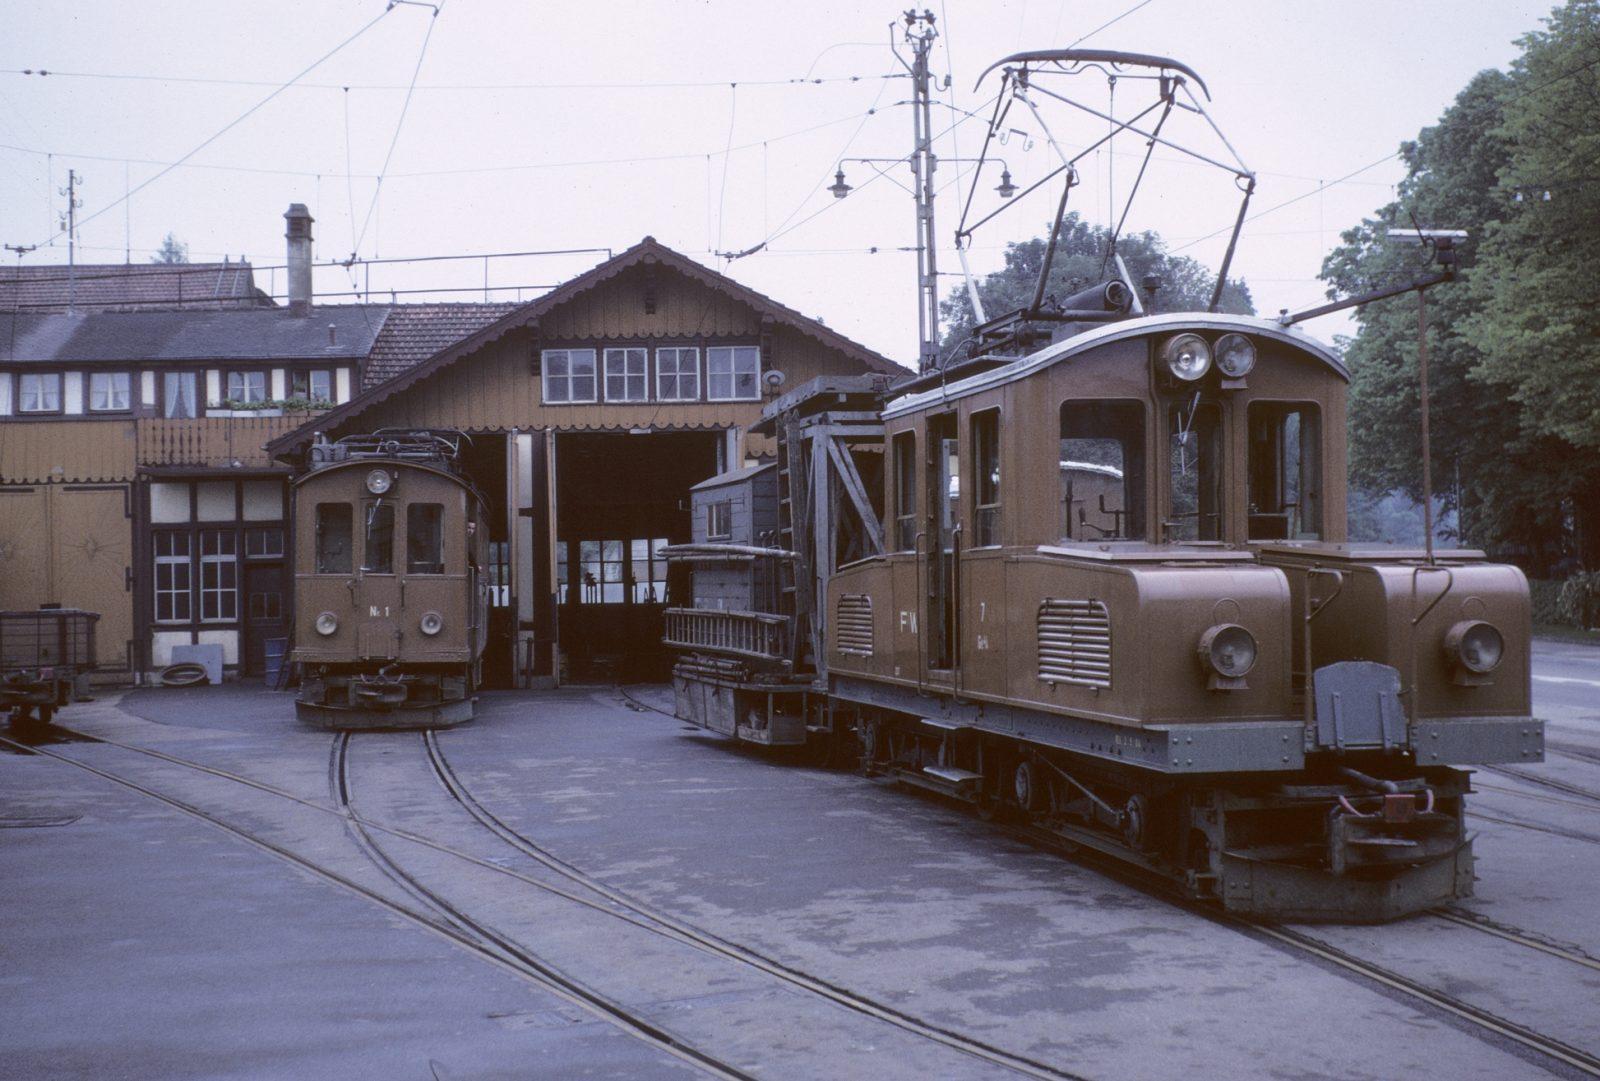 vor dem Depot Frauenfeld Stadt der Frauenfeld Wil Bahn